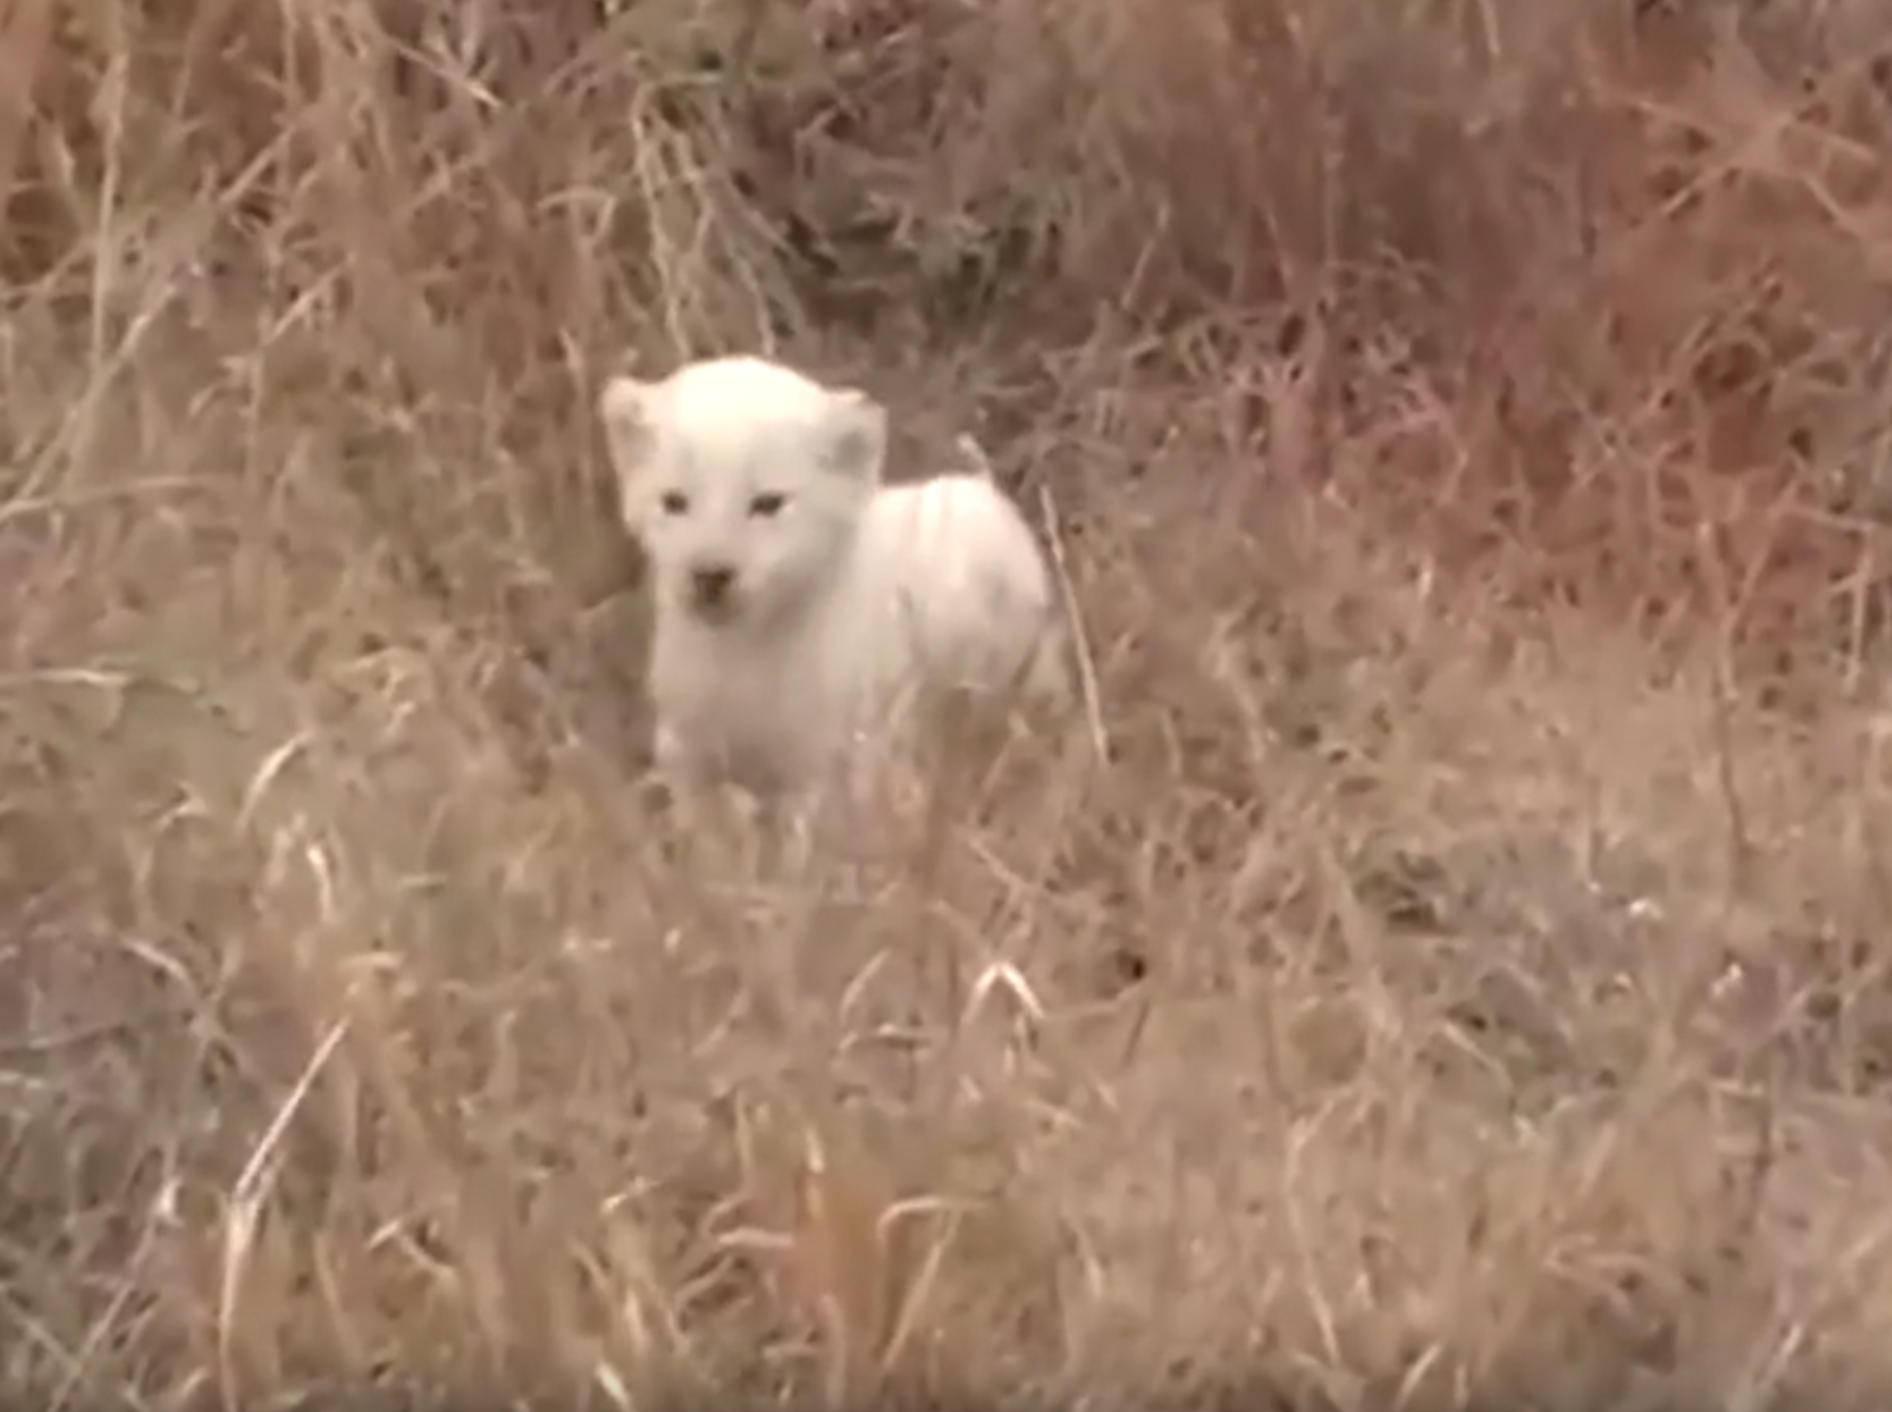 Hinreißend süßes Löwenbaby will furchteinflößend wirken – YouTube / Earth Touch